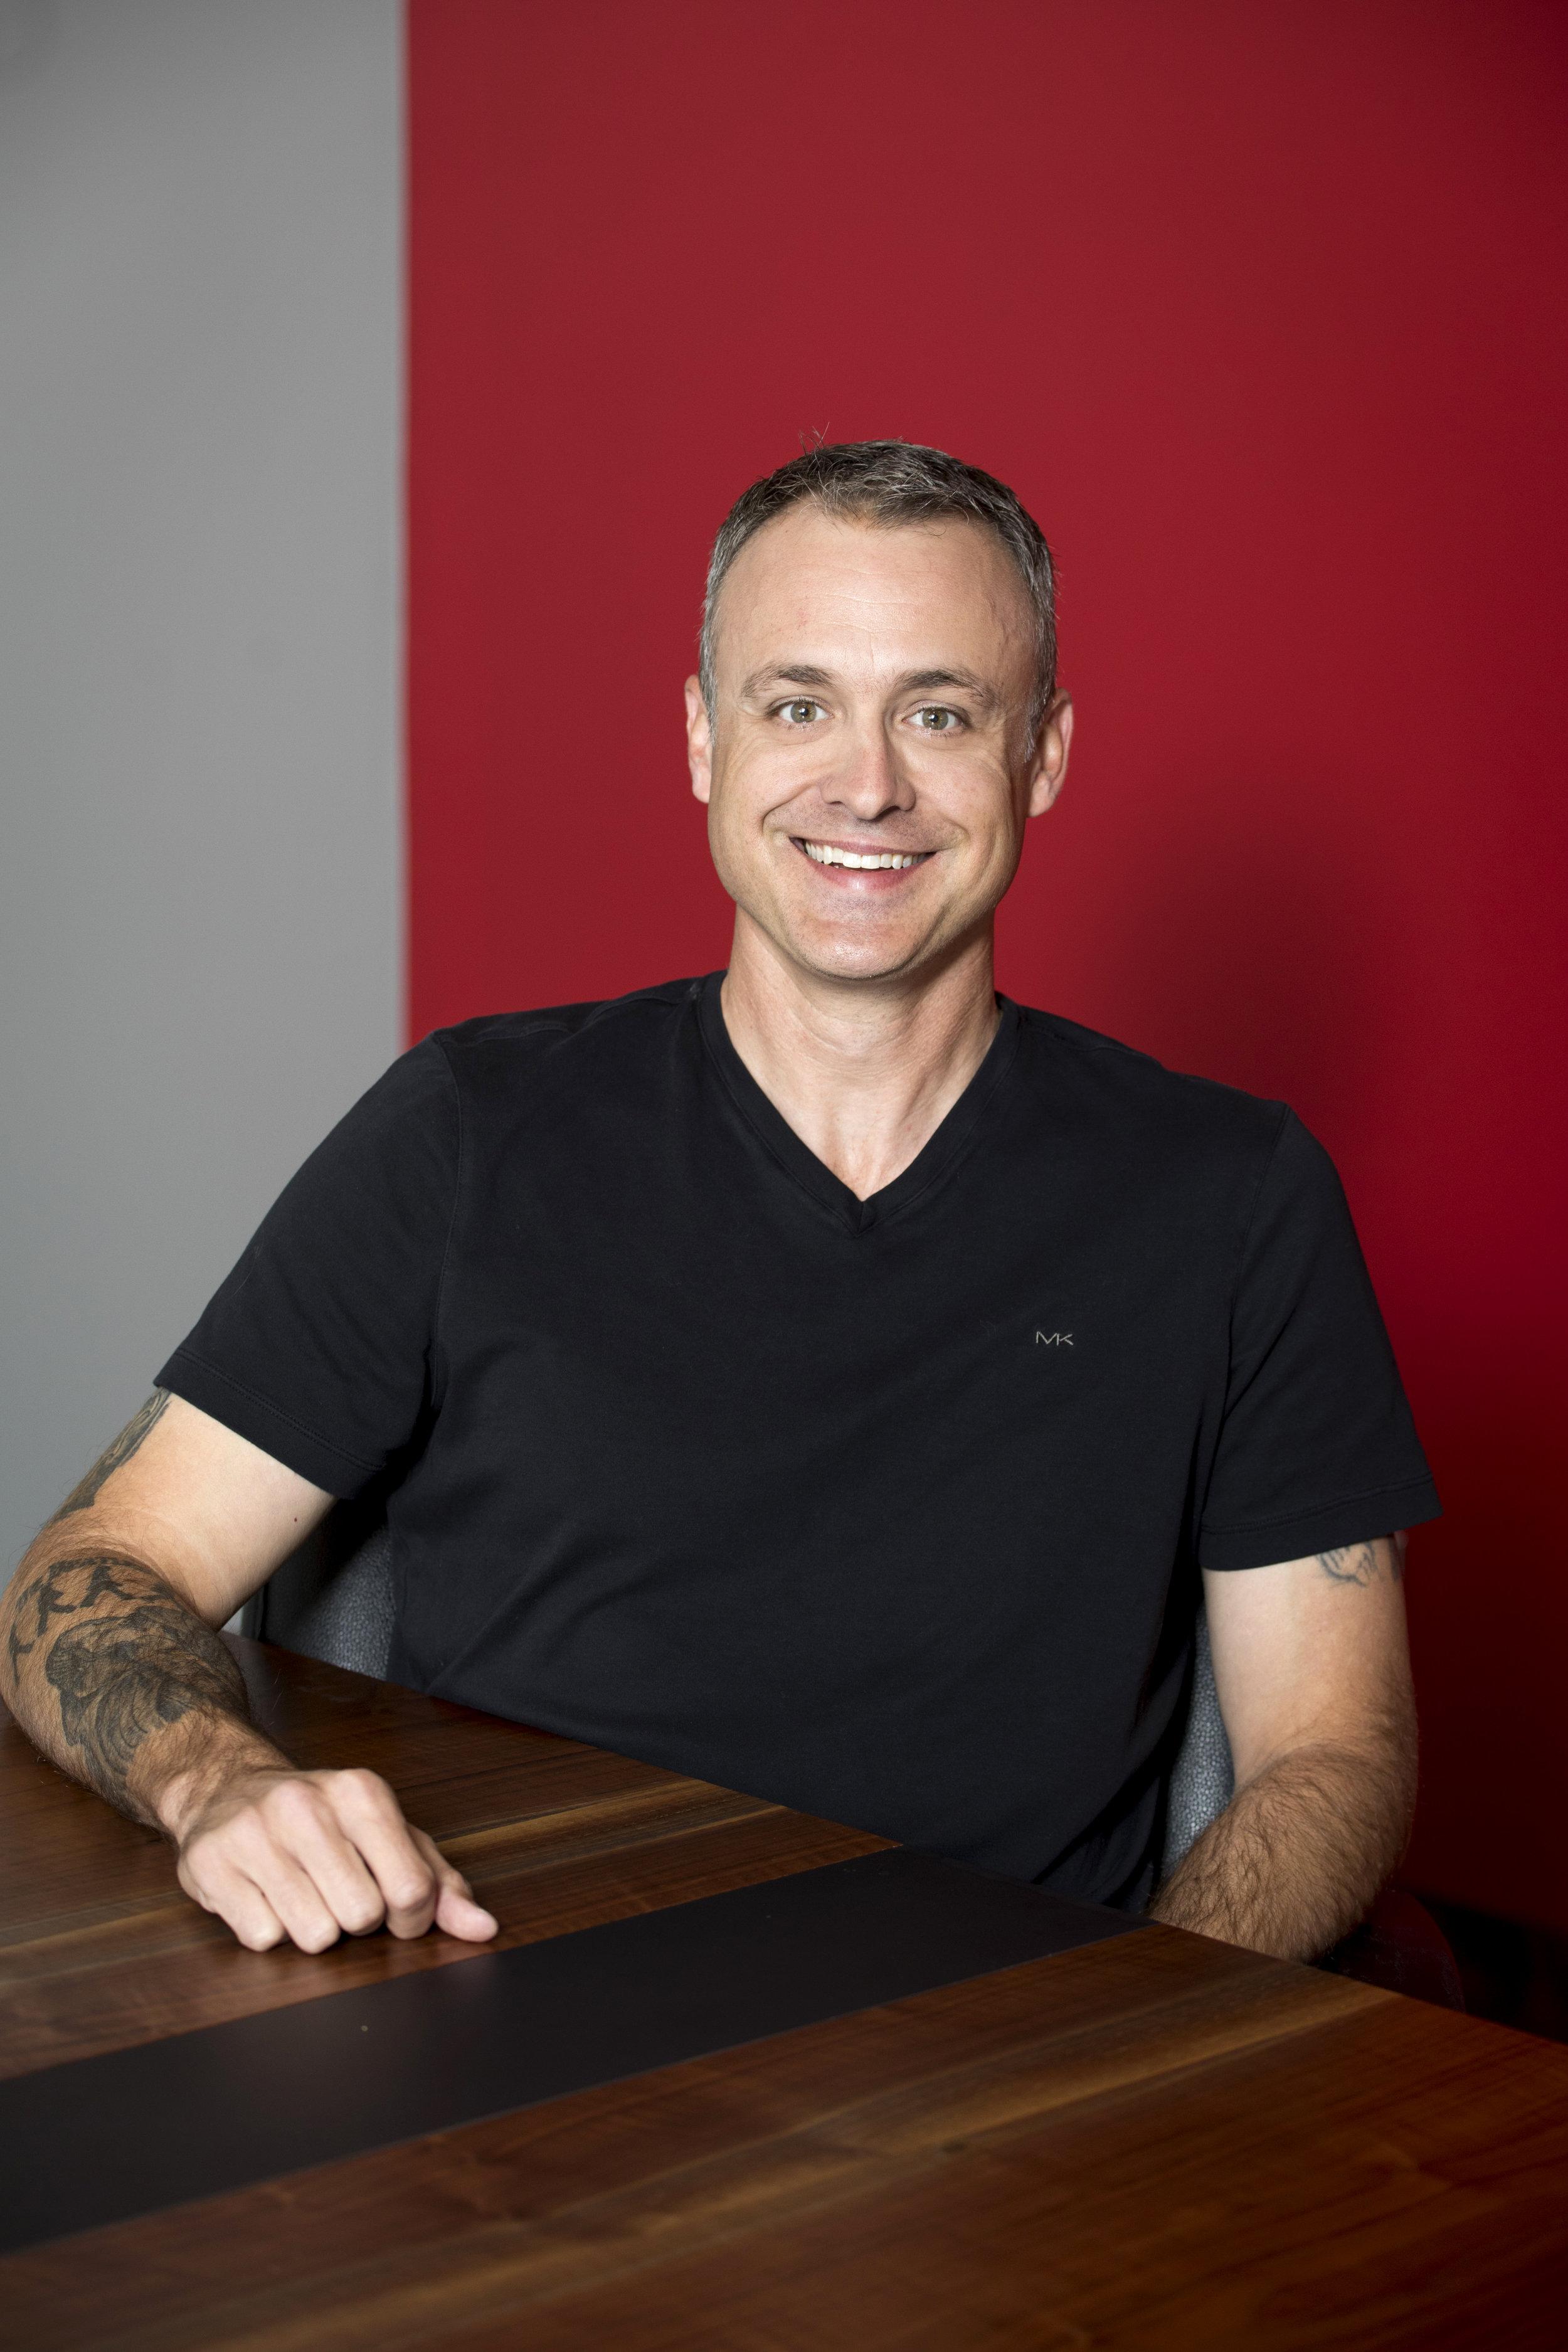 JOSH KIPPENBERGER | CEO